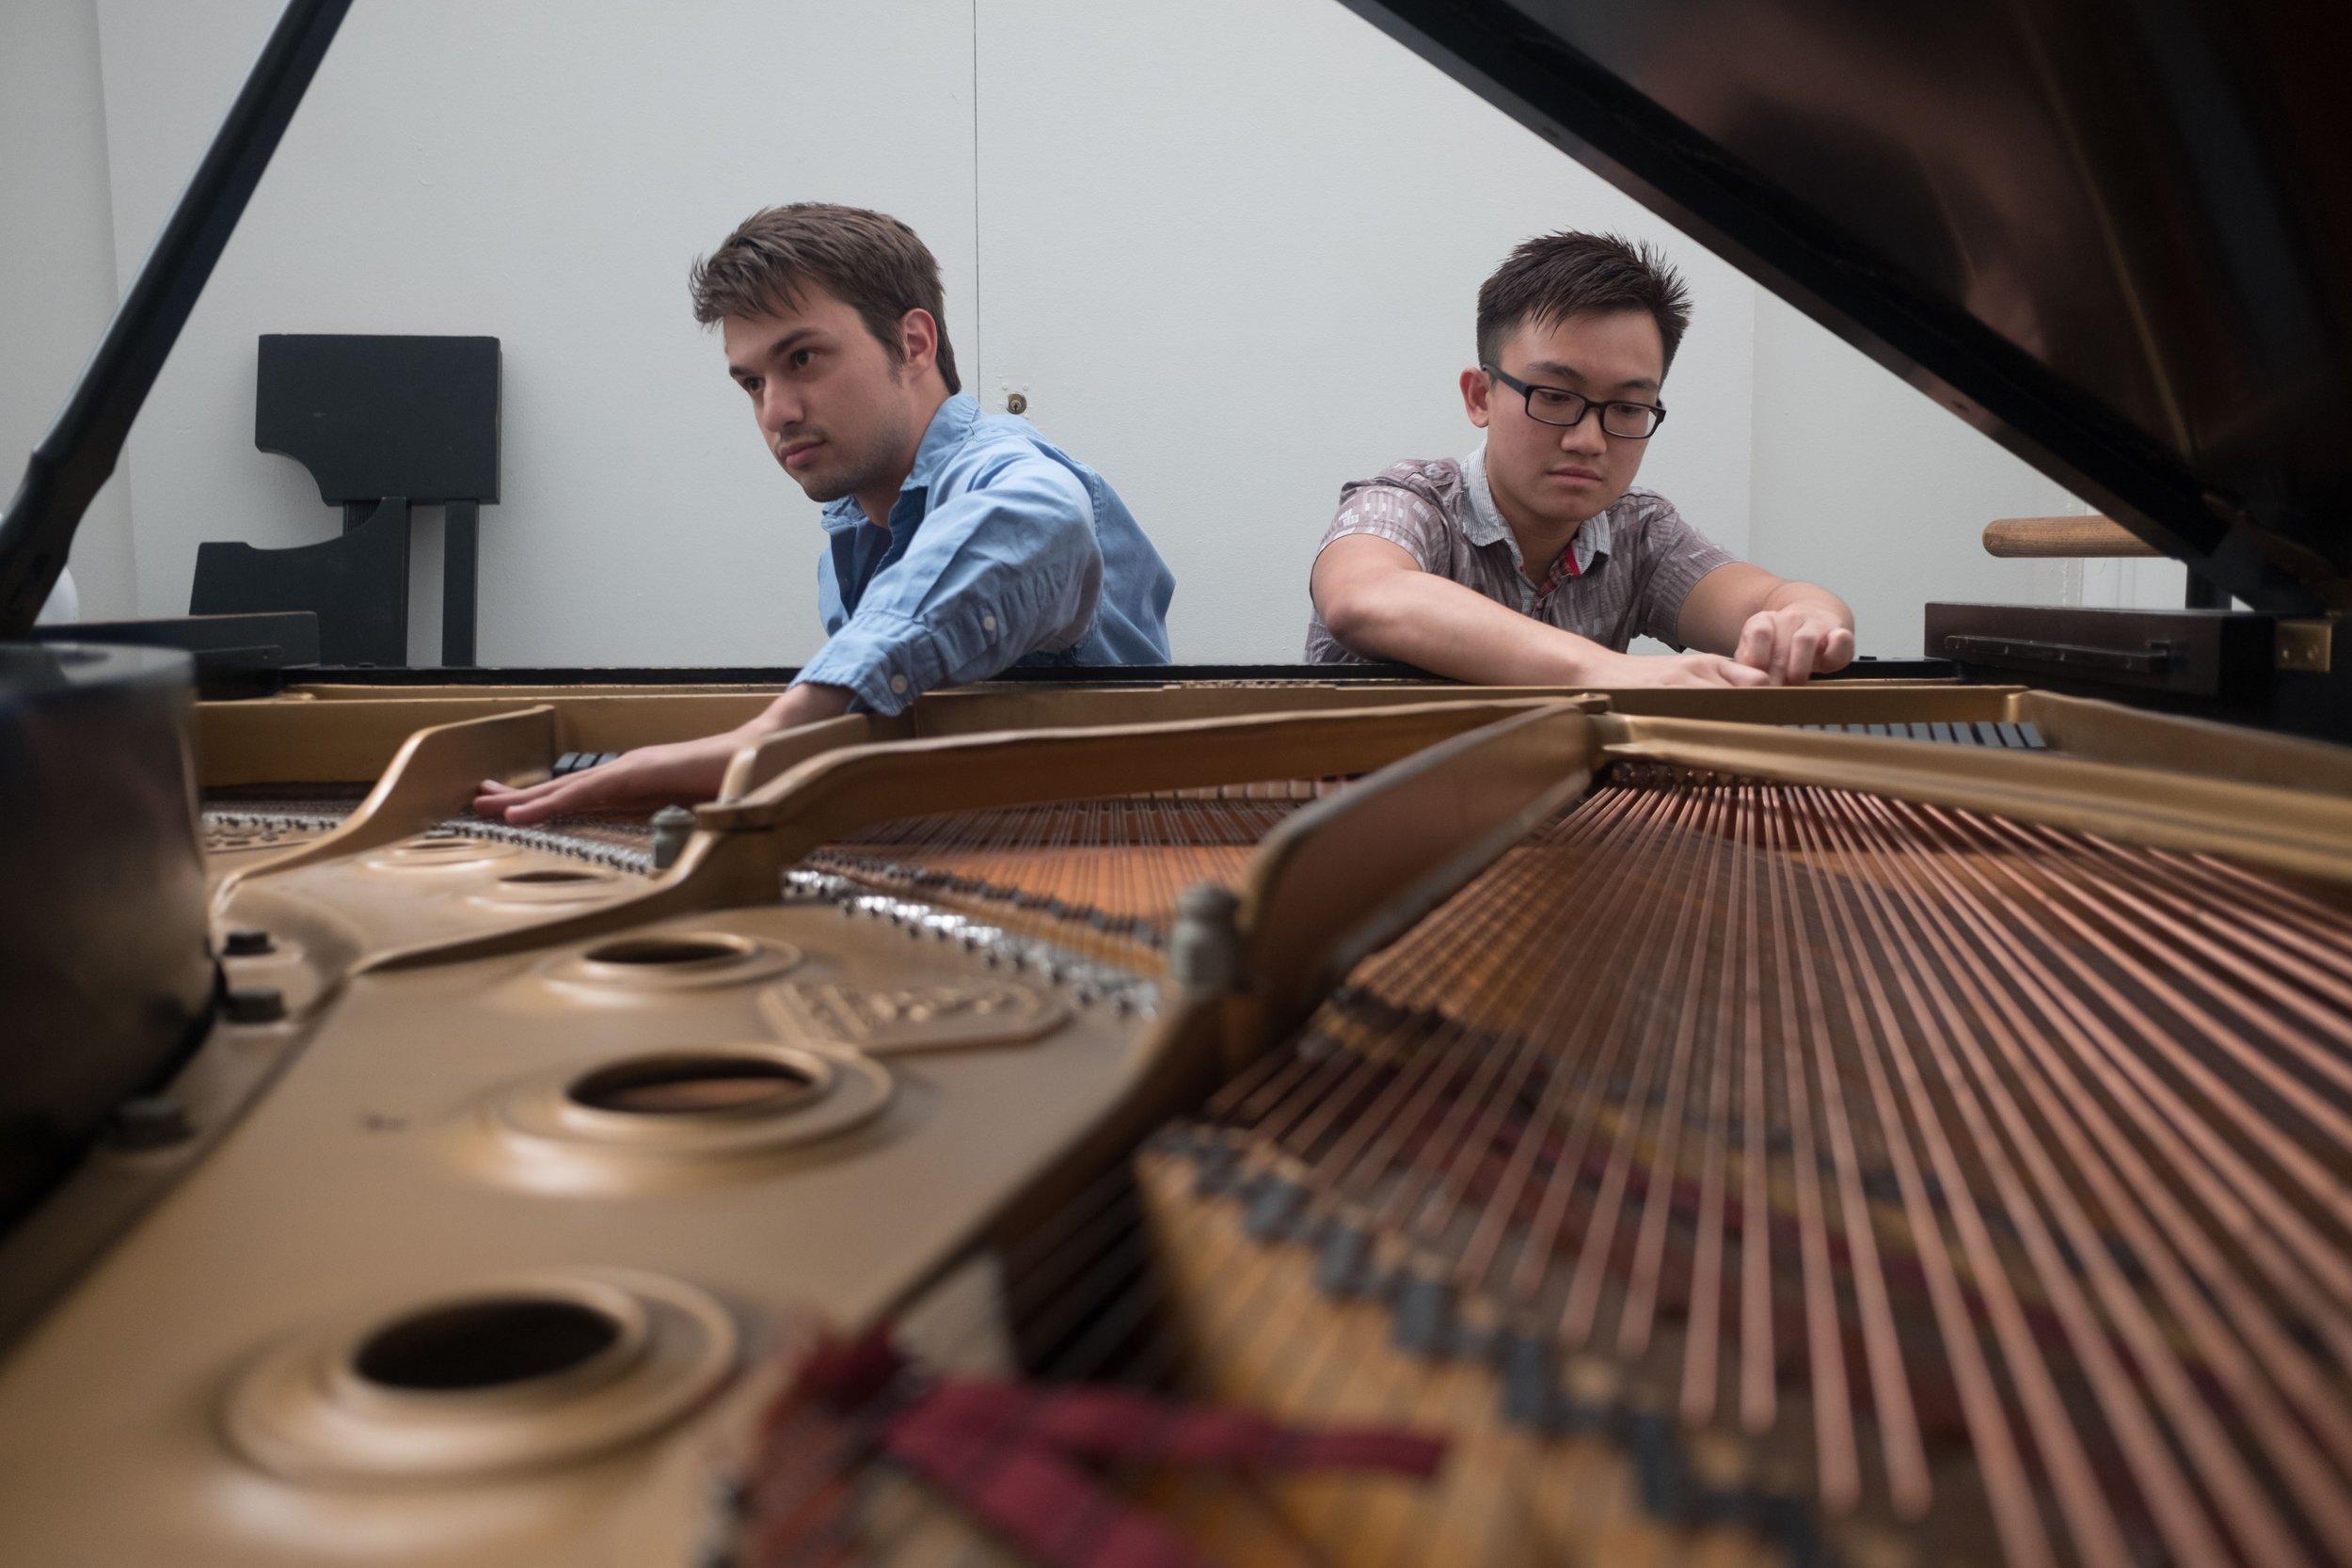 w/ Chris Staknys 2017 Improvisation jam at the Juilliard School